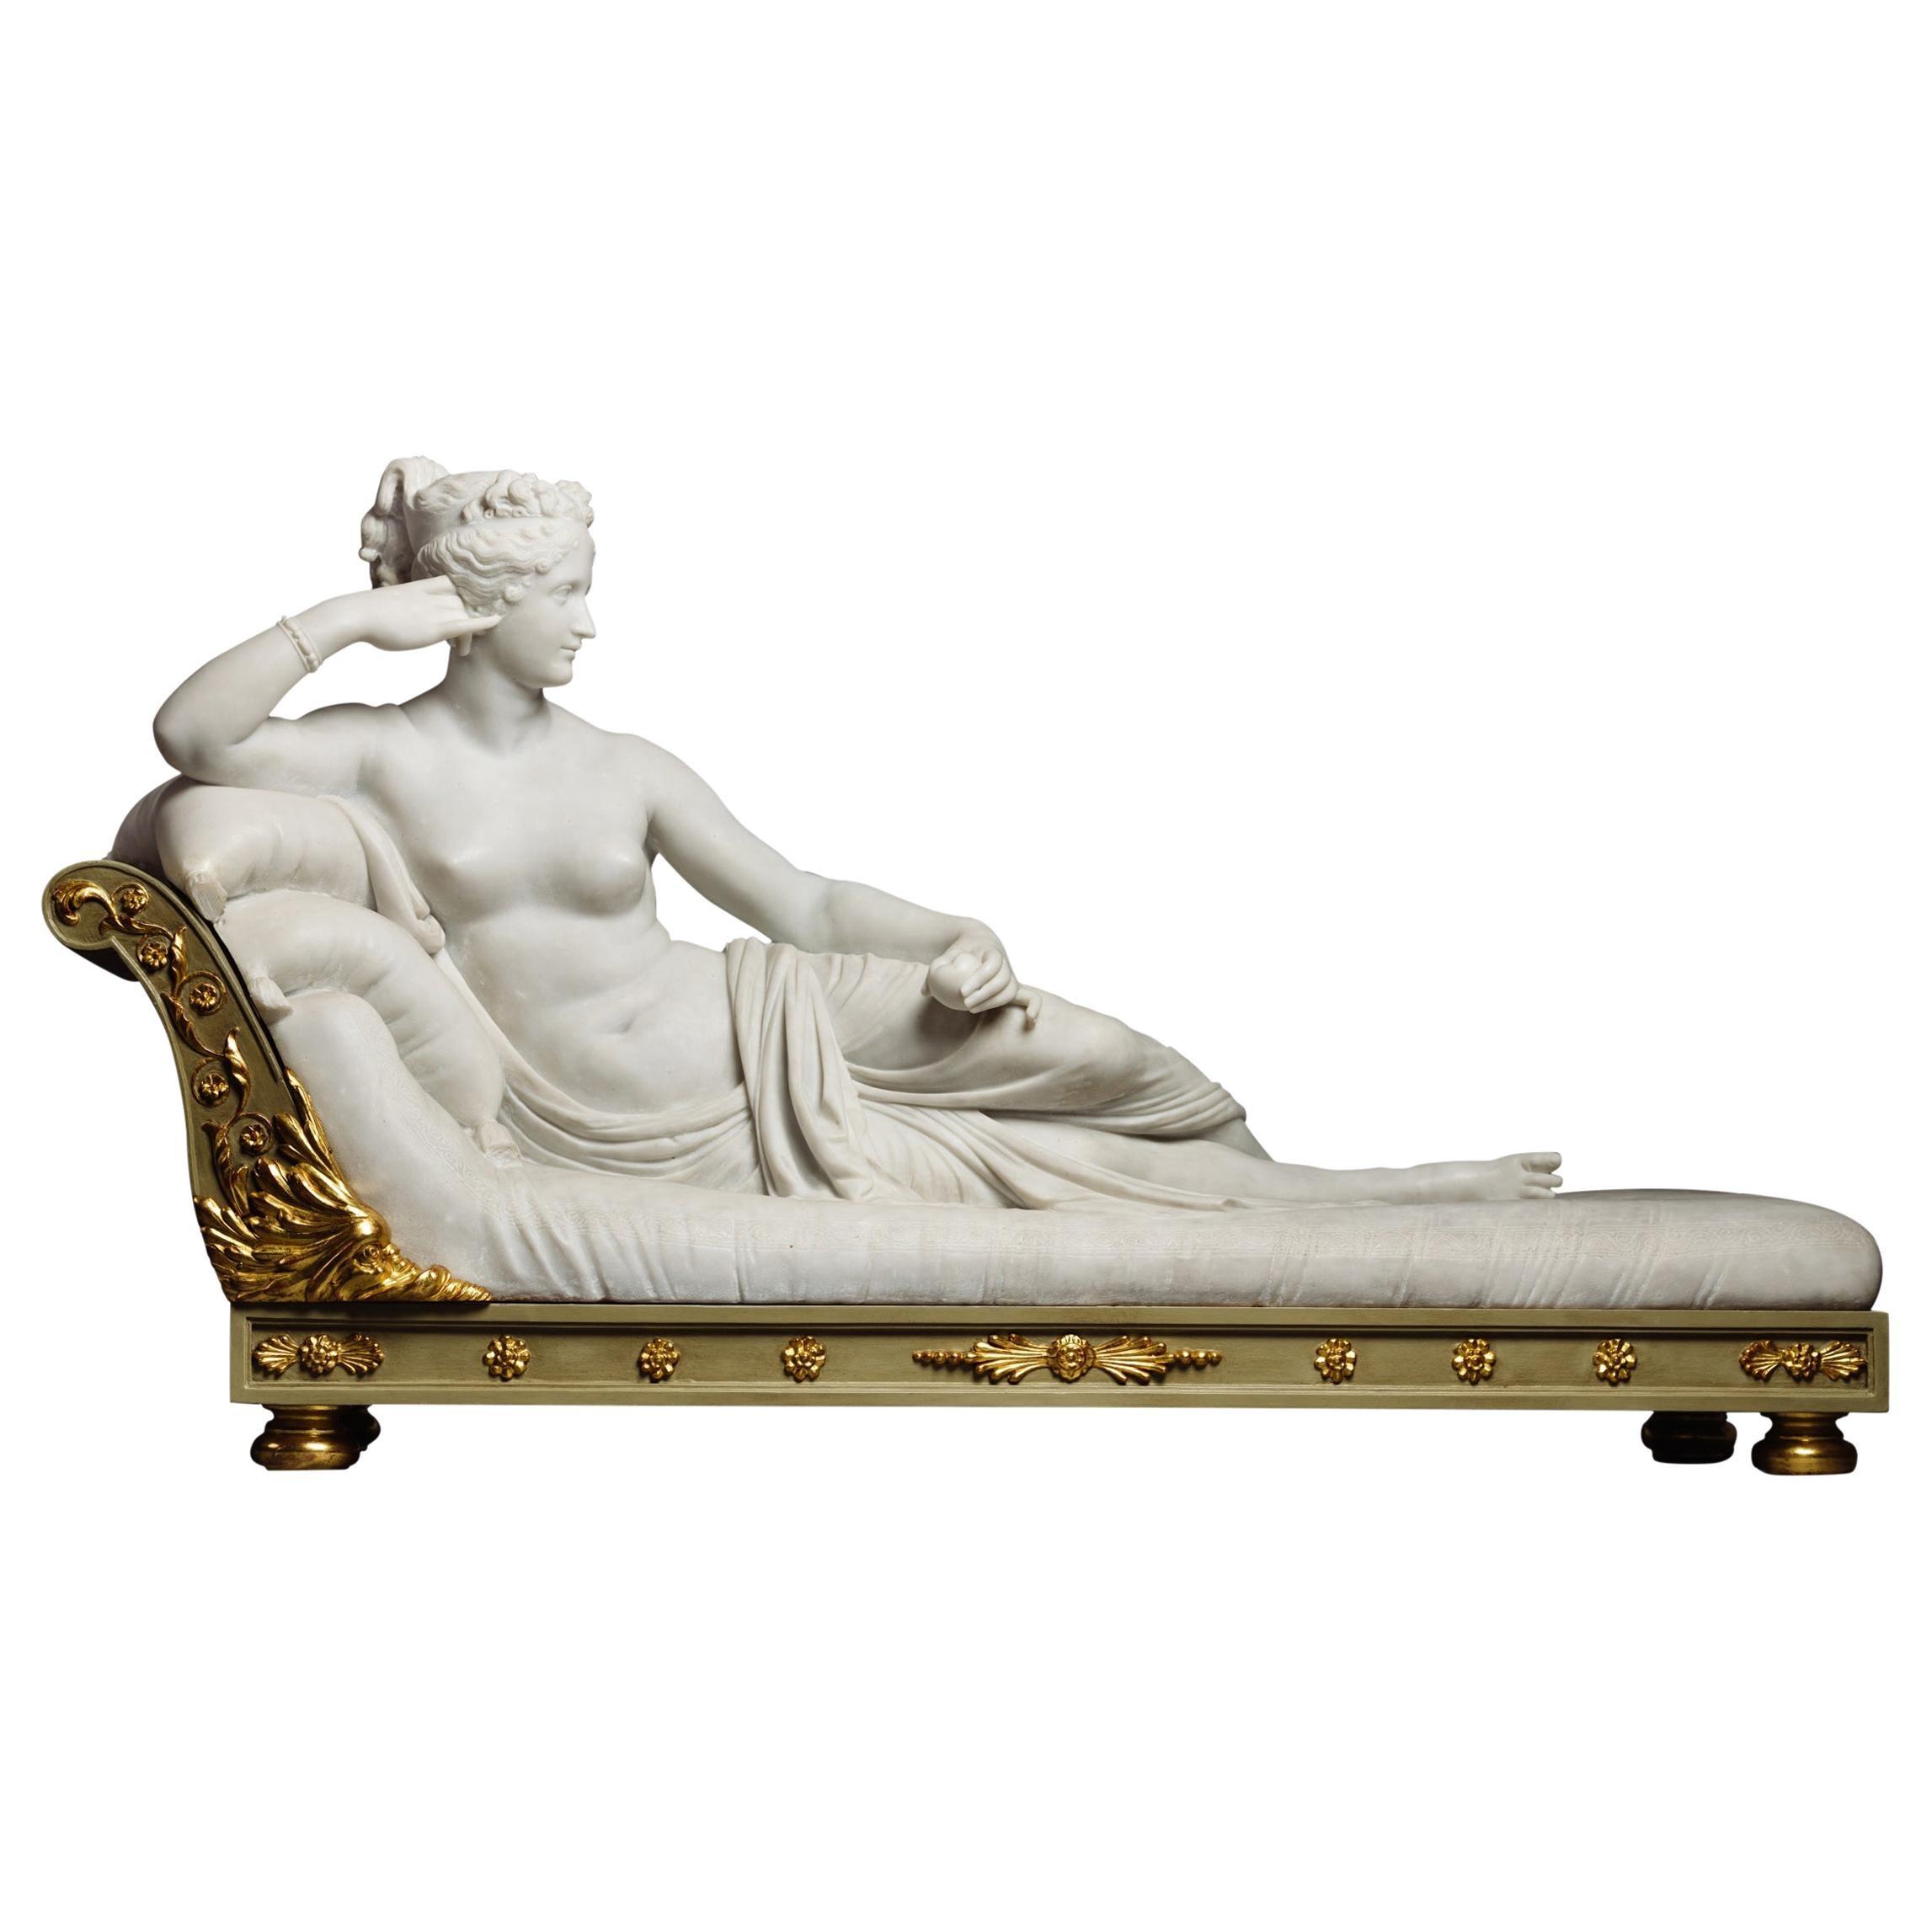 Venus Victrix, Marble Sculpture after Antonio Canova, circa 1890